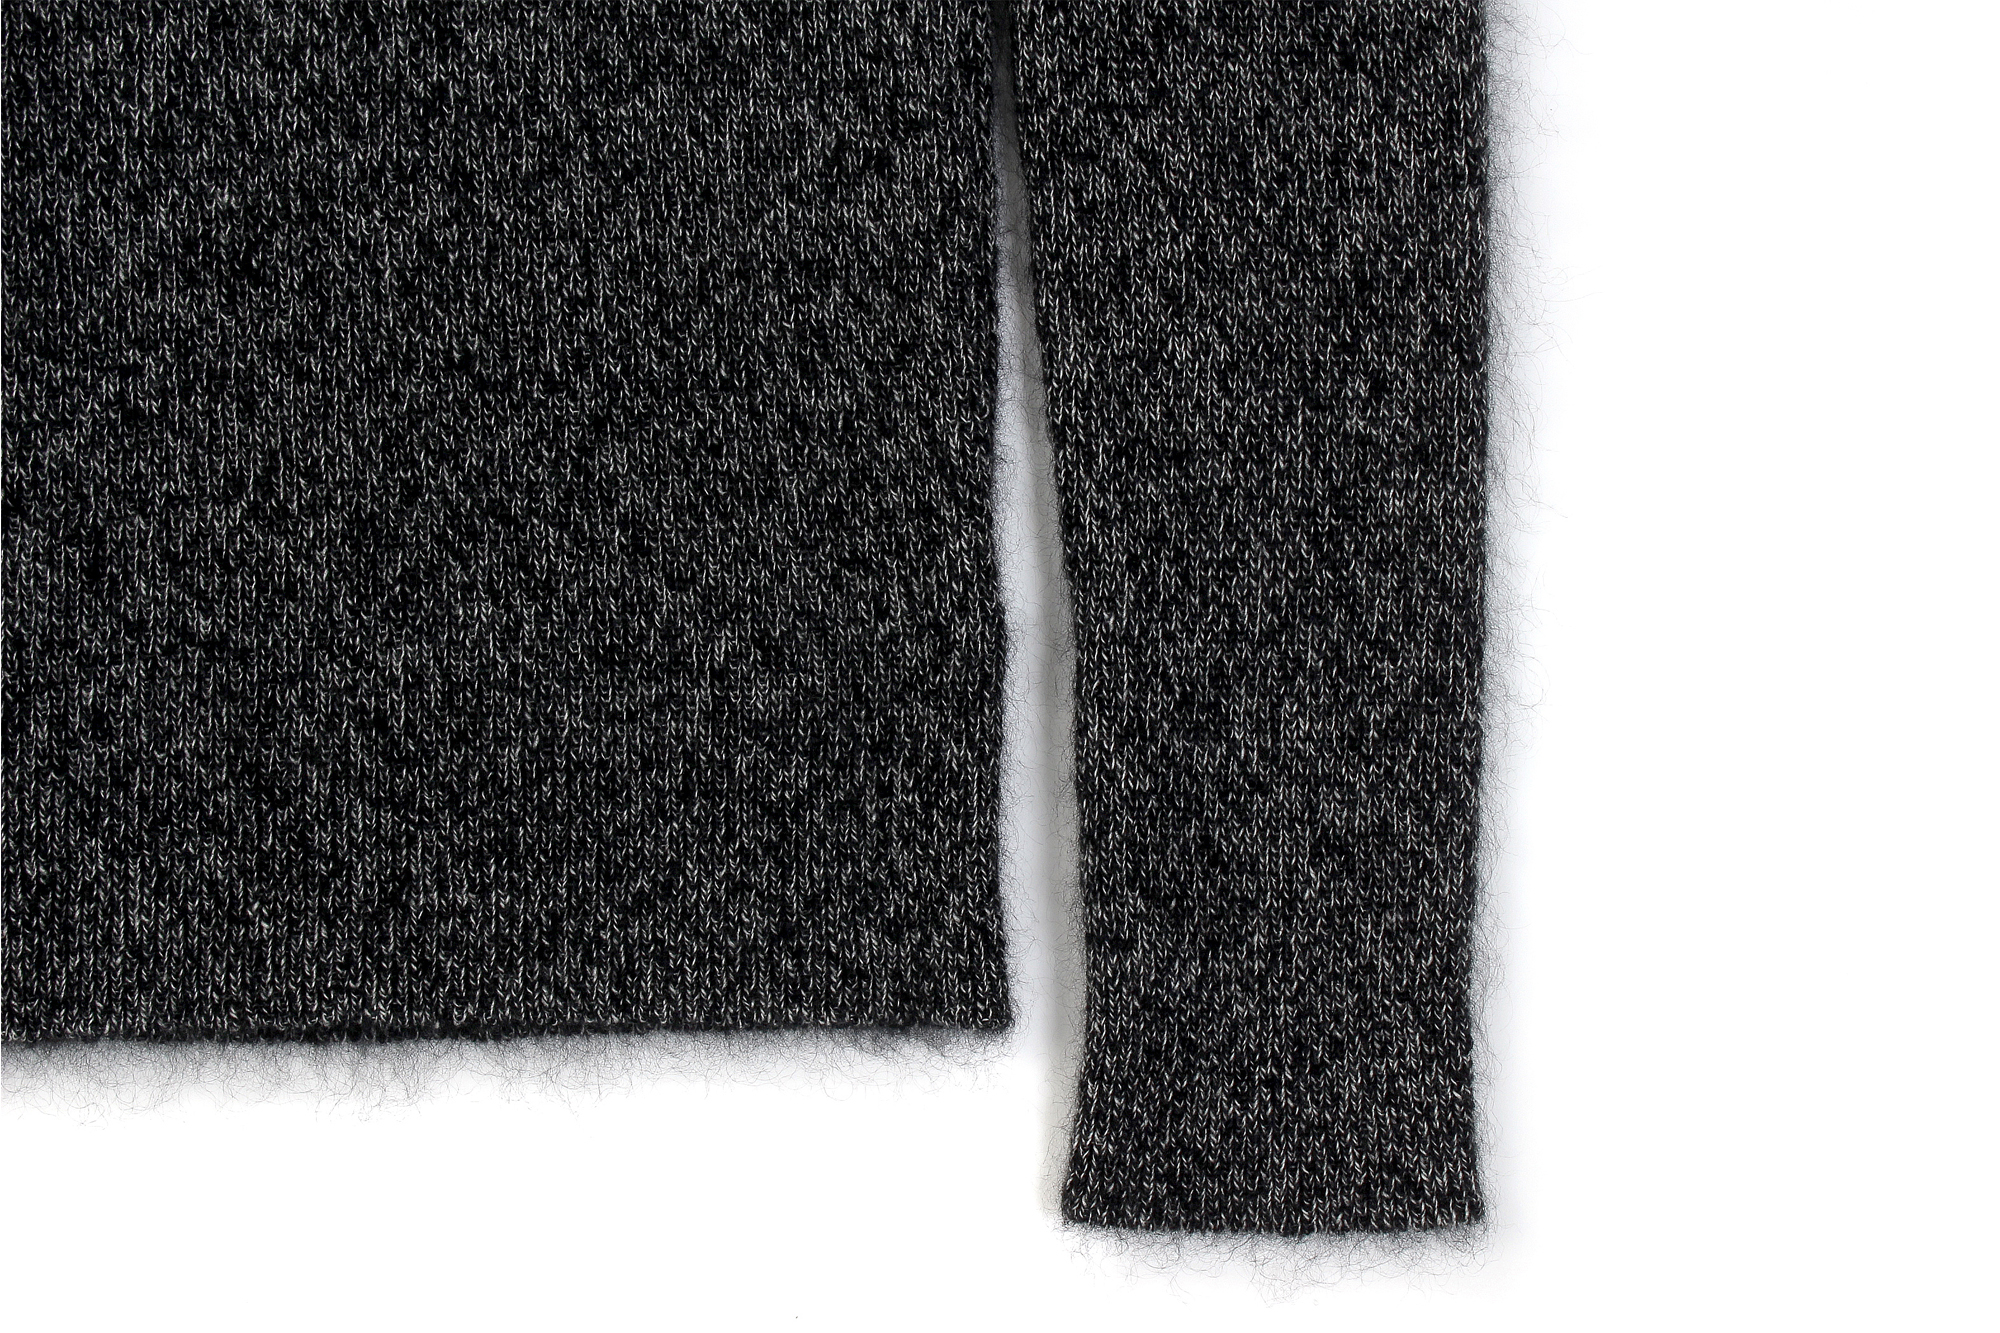 RIVORA / リヴォラ (2020 秋冬 展示会) R22-MKT005 GENTLE KNIT Round Neck 010 Black R22-MKT006 GENTLE KNIT High Neck 010 Black カシミヤ モヘア シルク クルーネック タートルネック 栗生田弓 YUMIAOTA altoediritto アルトエデリット ニット